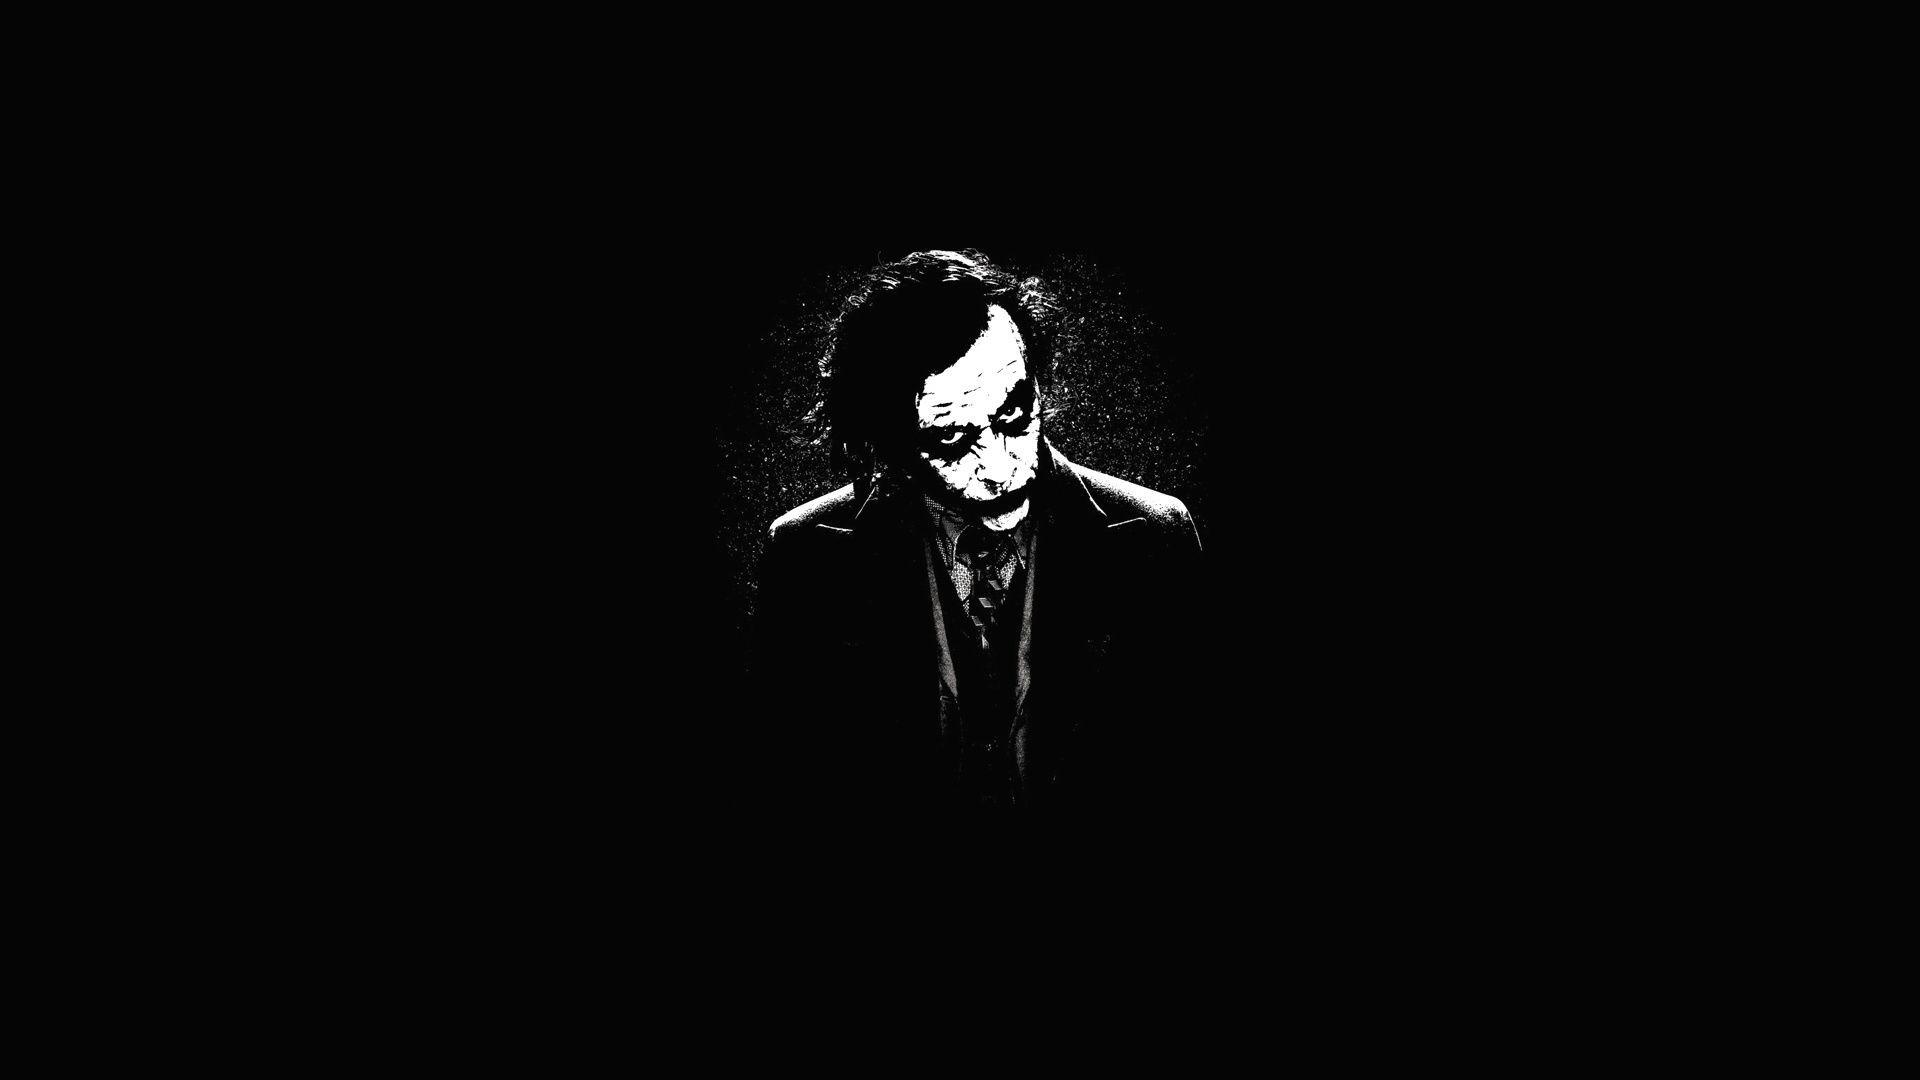 Face Batman Batman Dark Knight Joker Smile Dark RITS Desktop